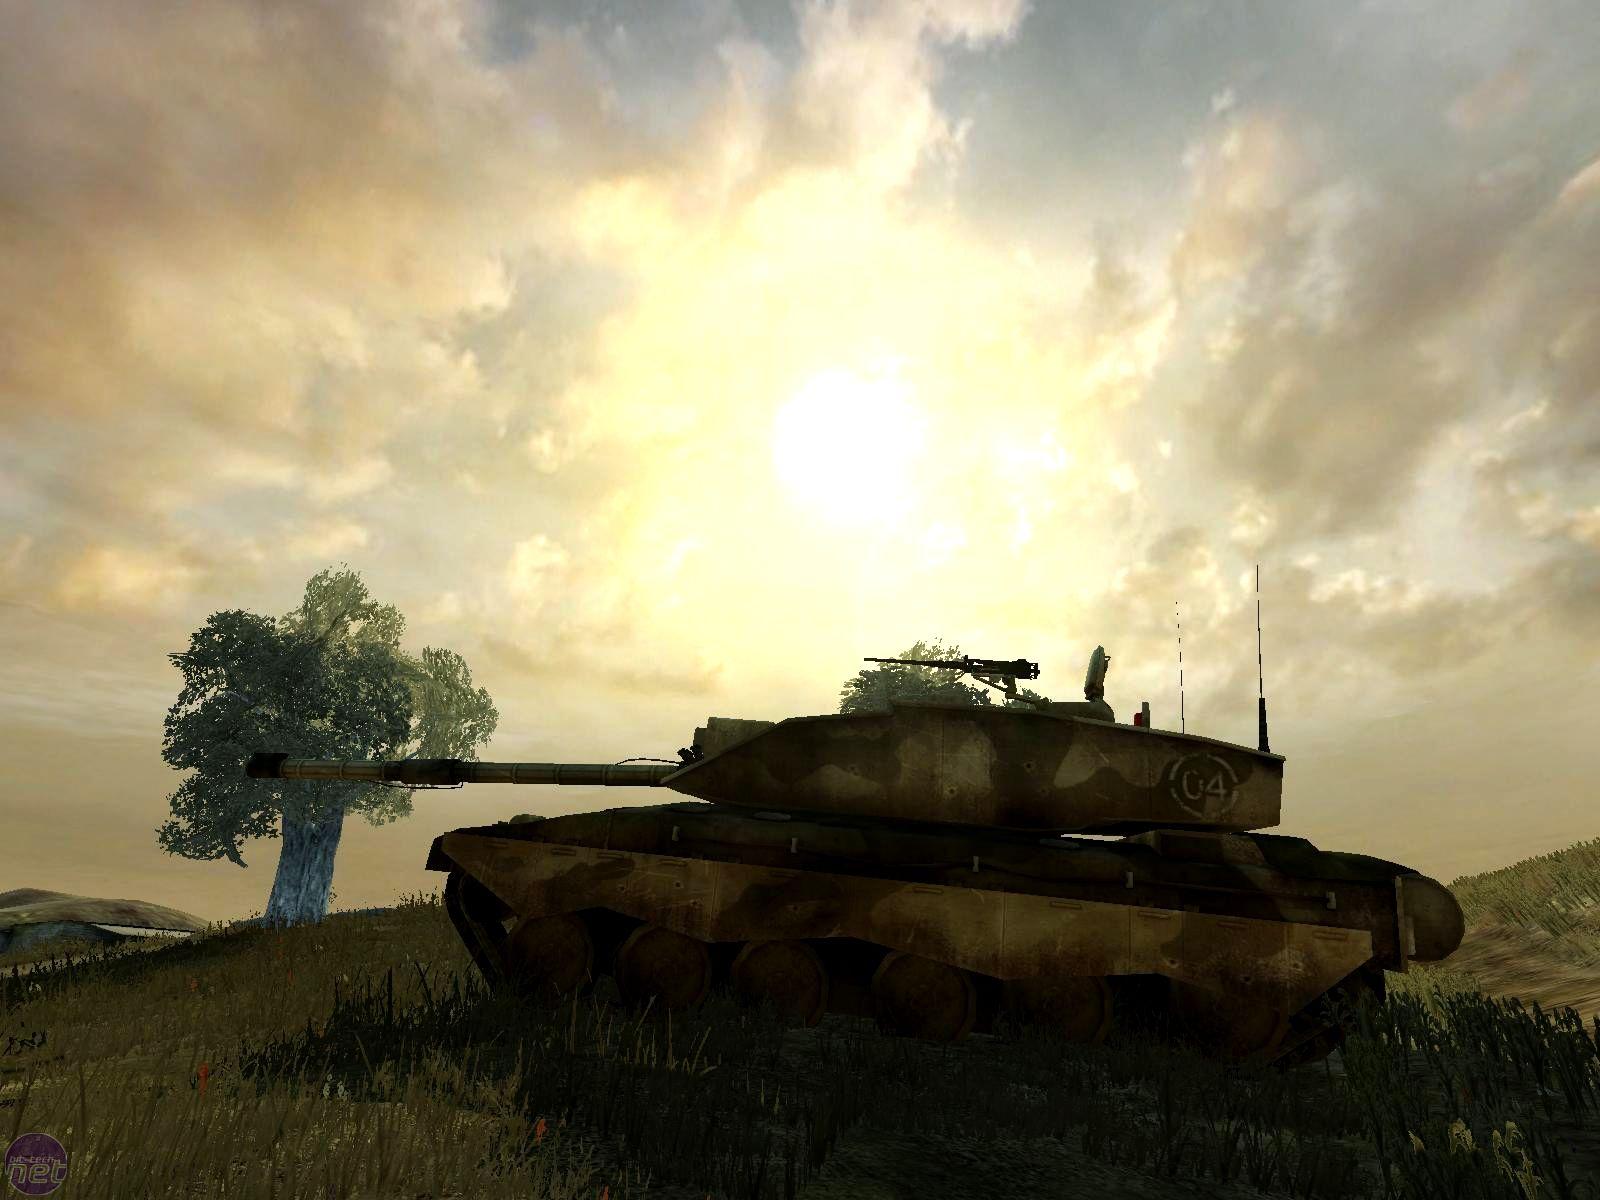 Euro forces battlefield 2